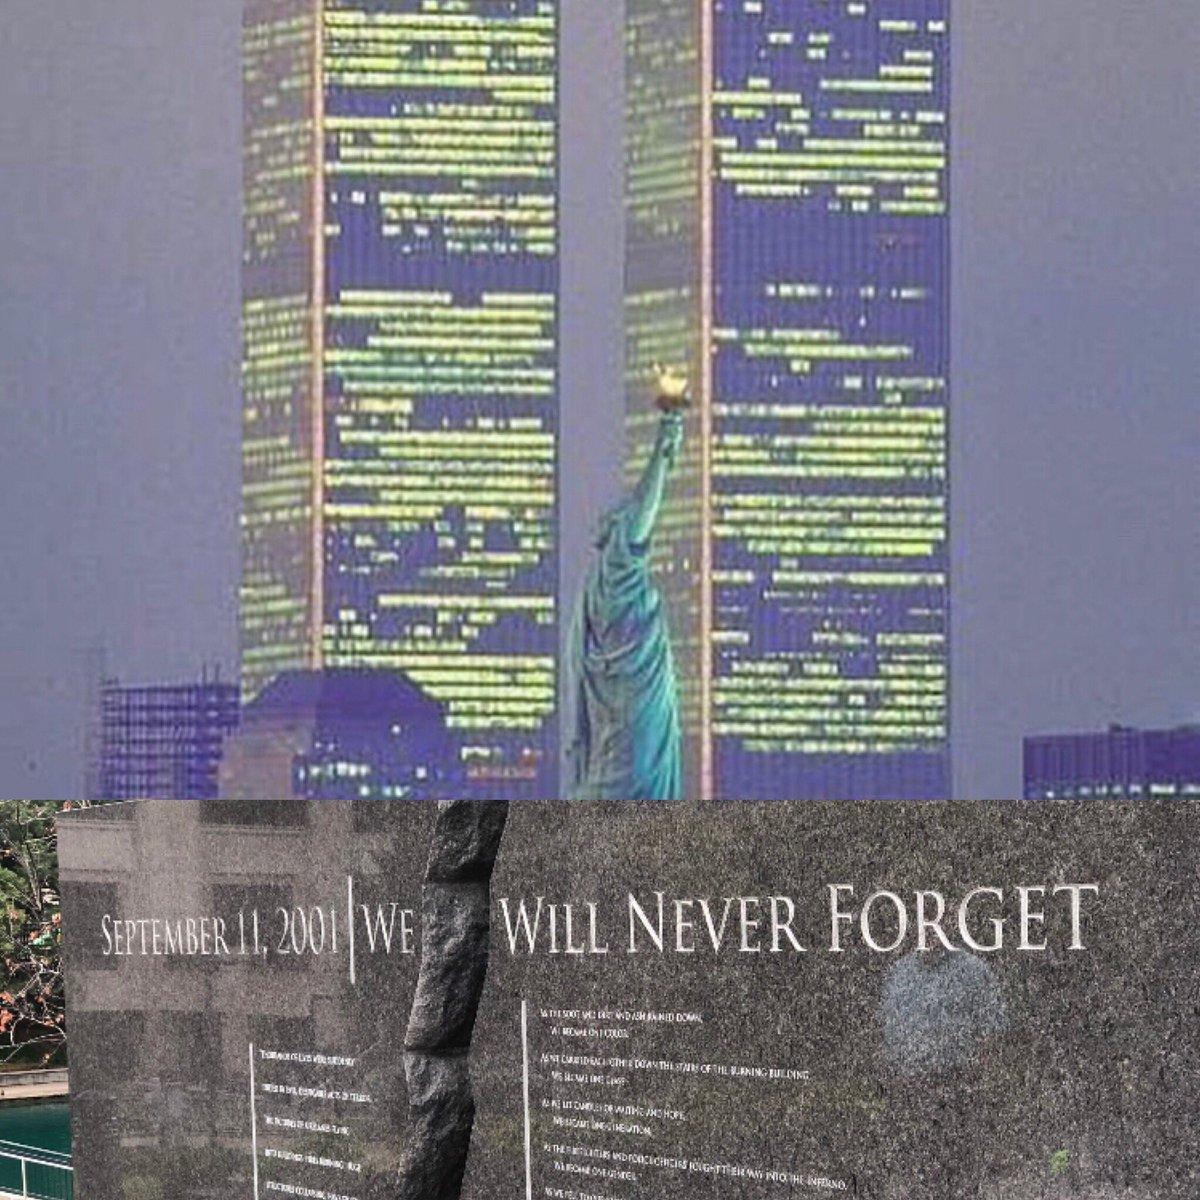 @jjyeley1's photo on #AmericaStrong